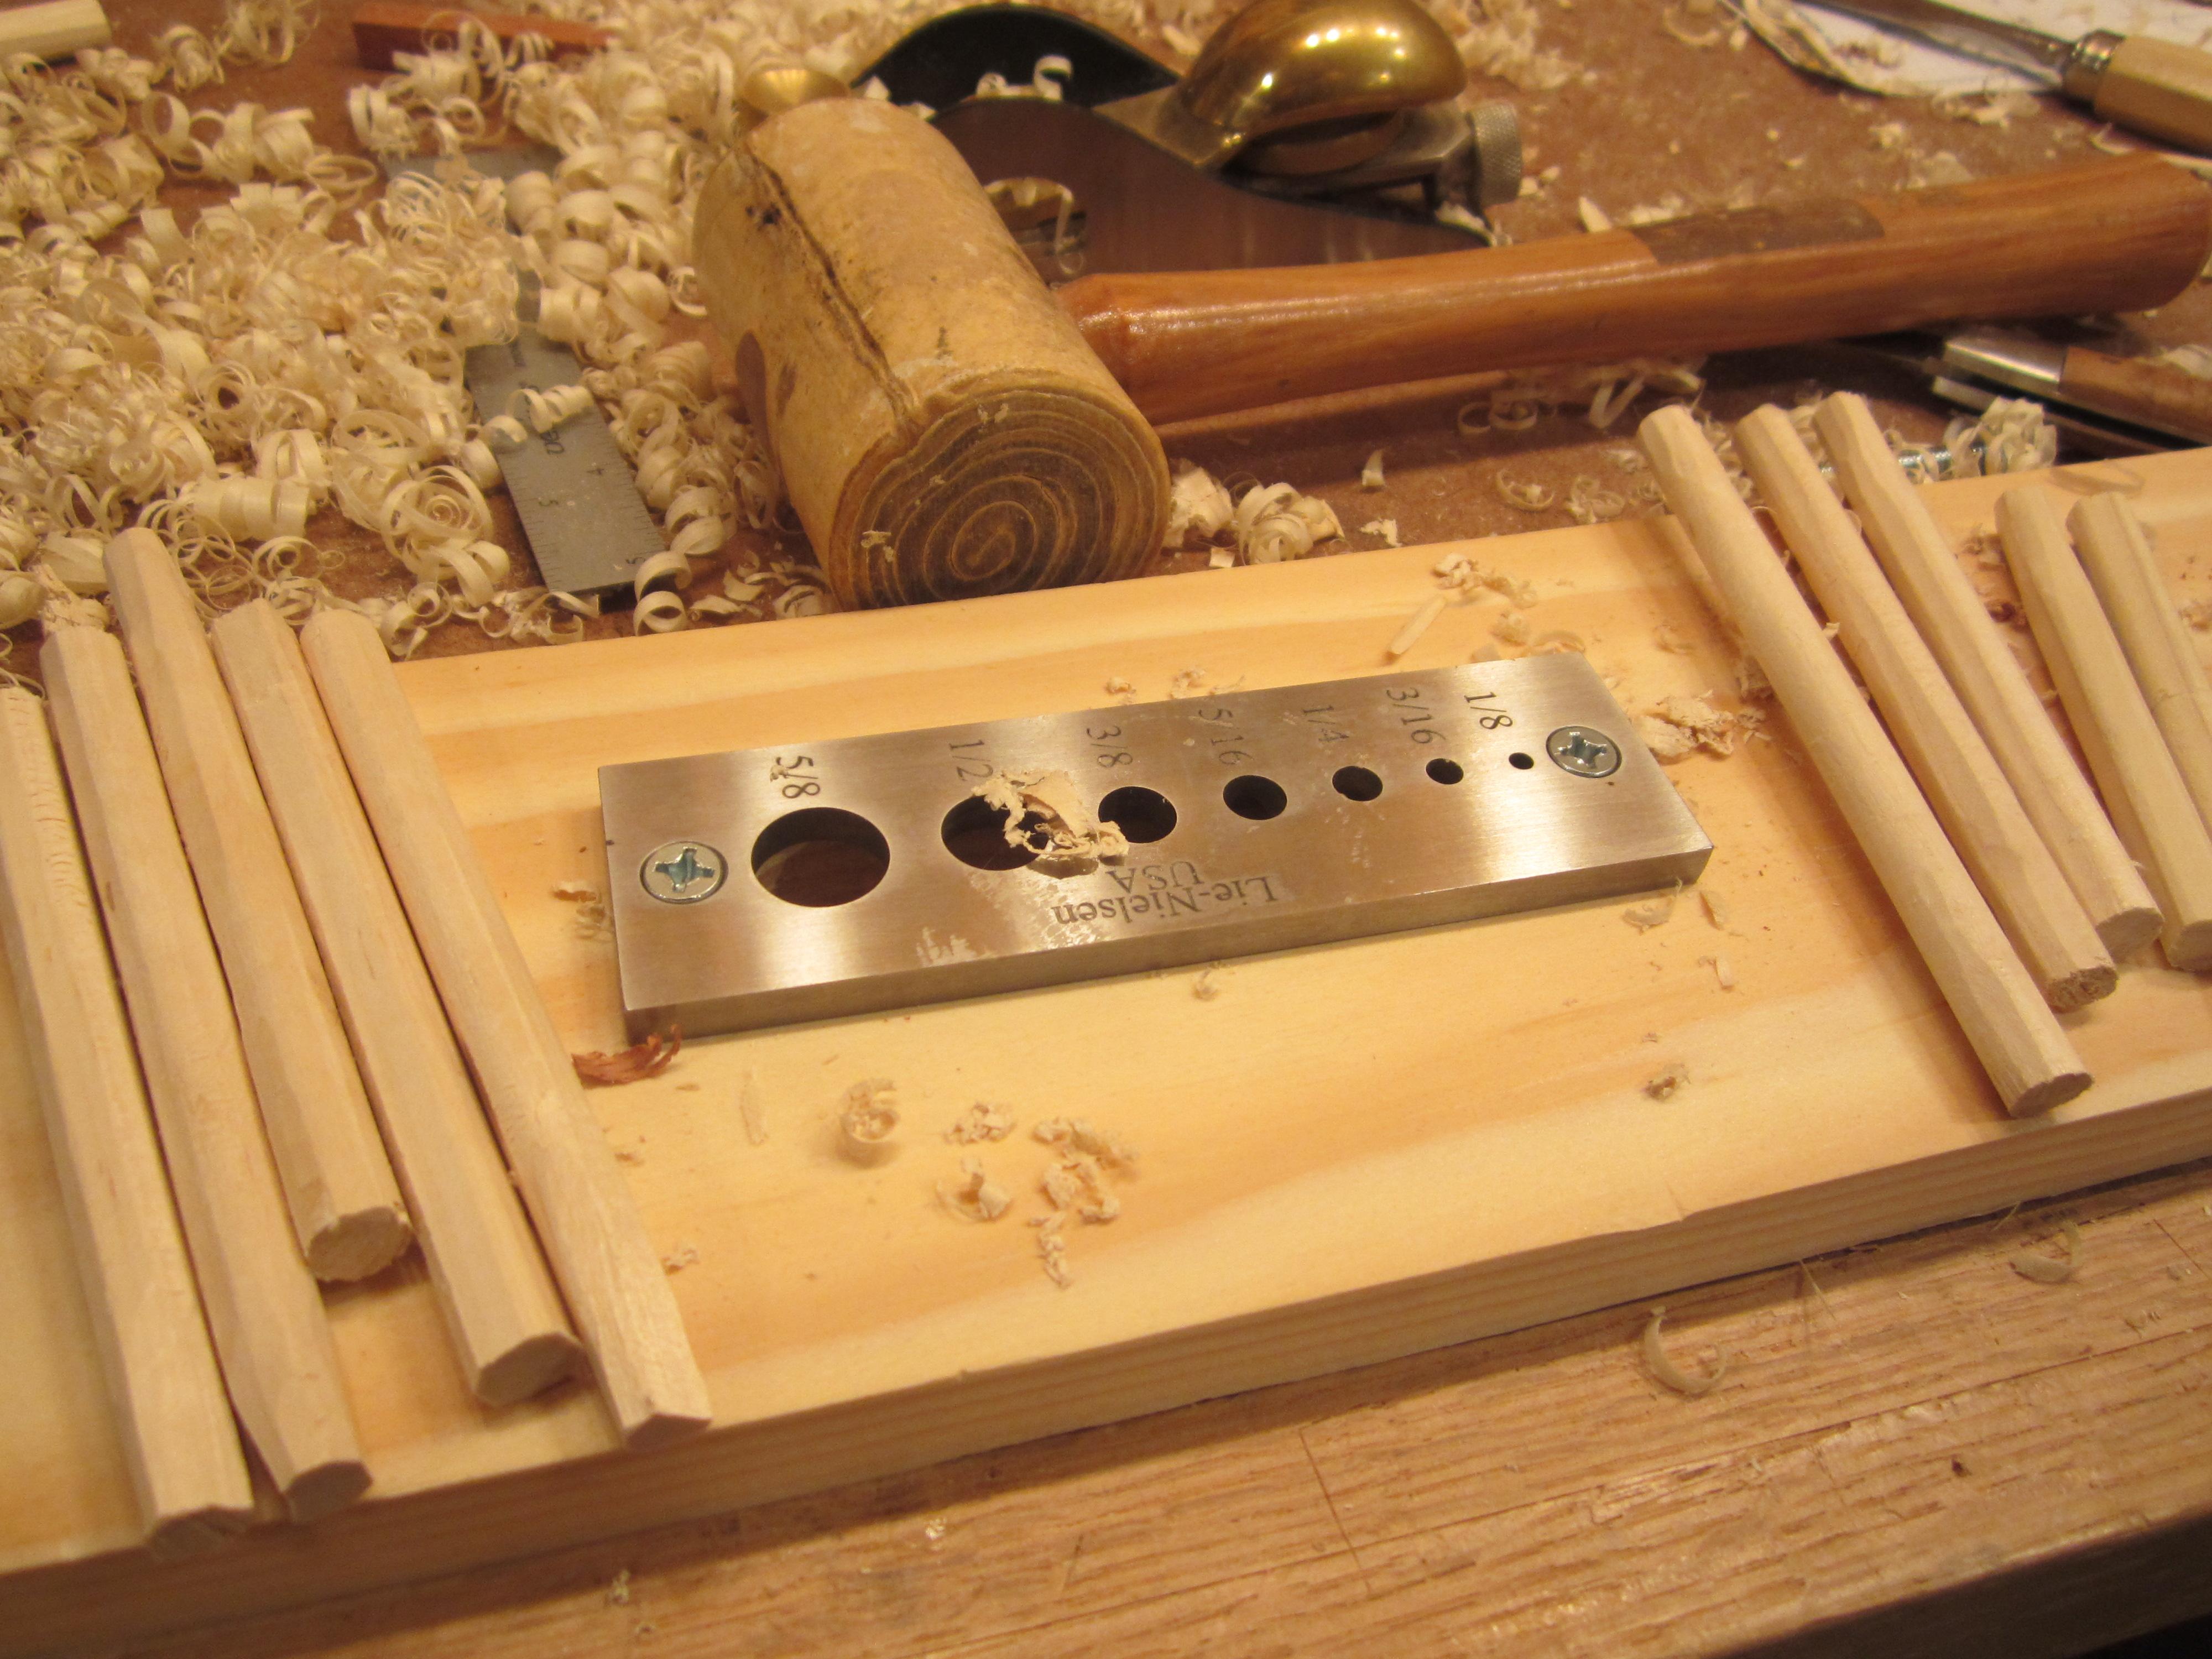 Wood Dowel Tool Plans Free Download Tenuous44ukg